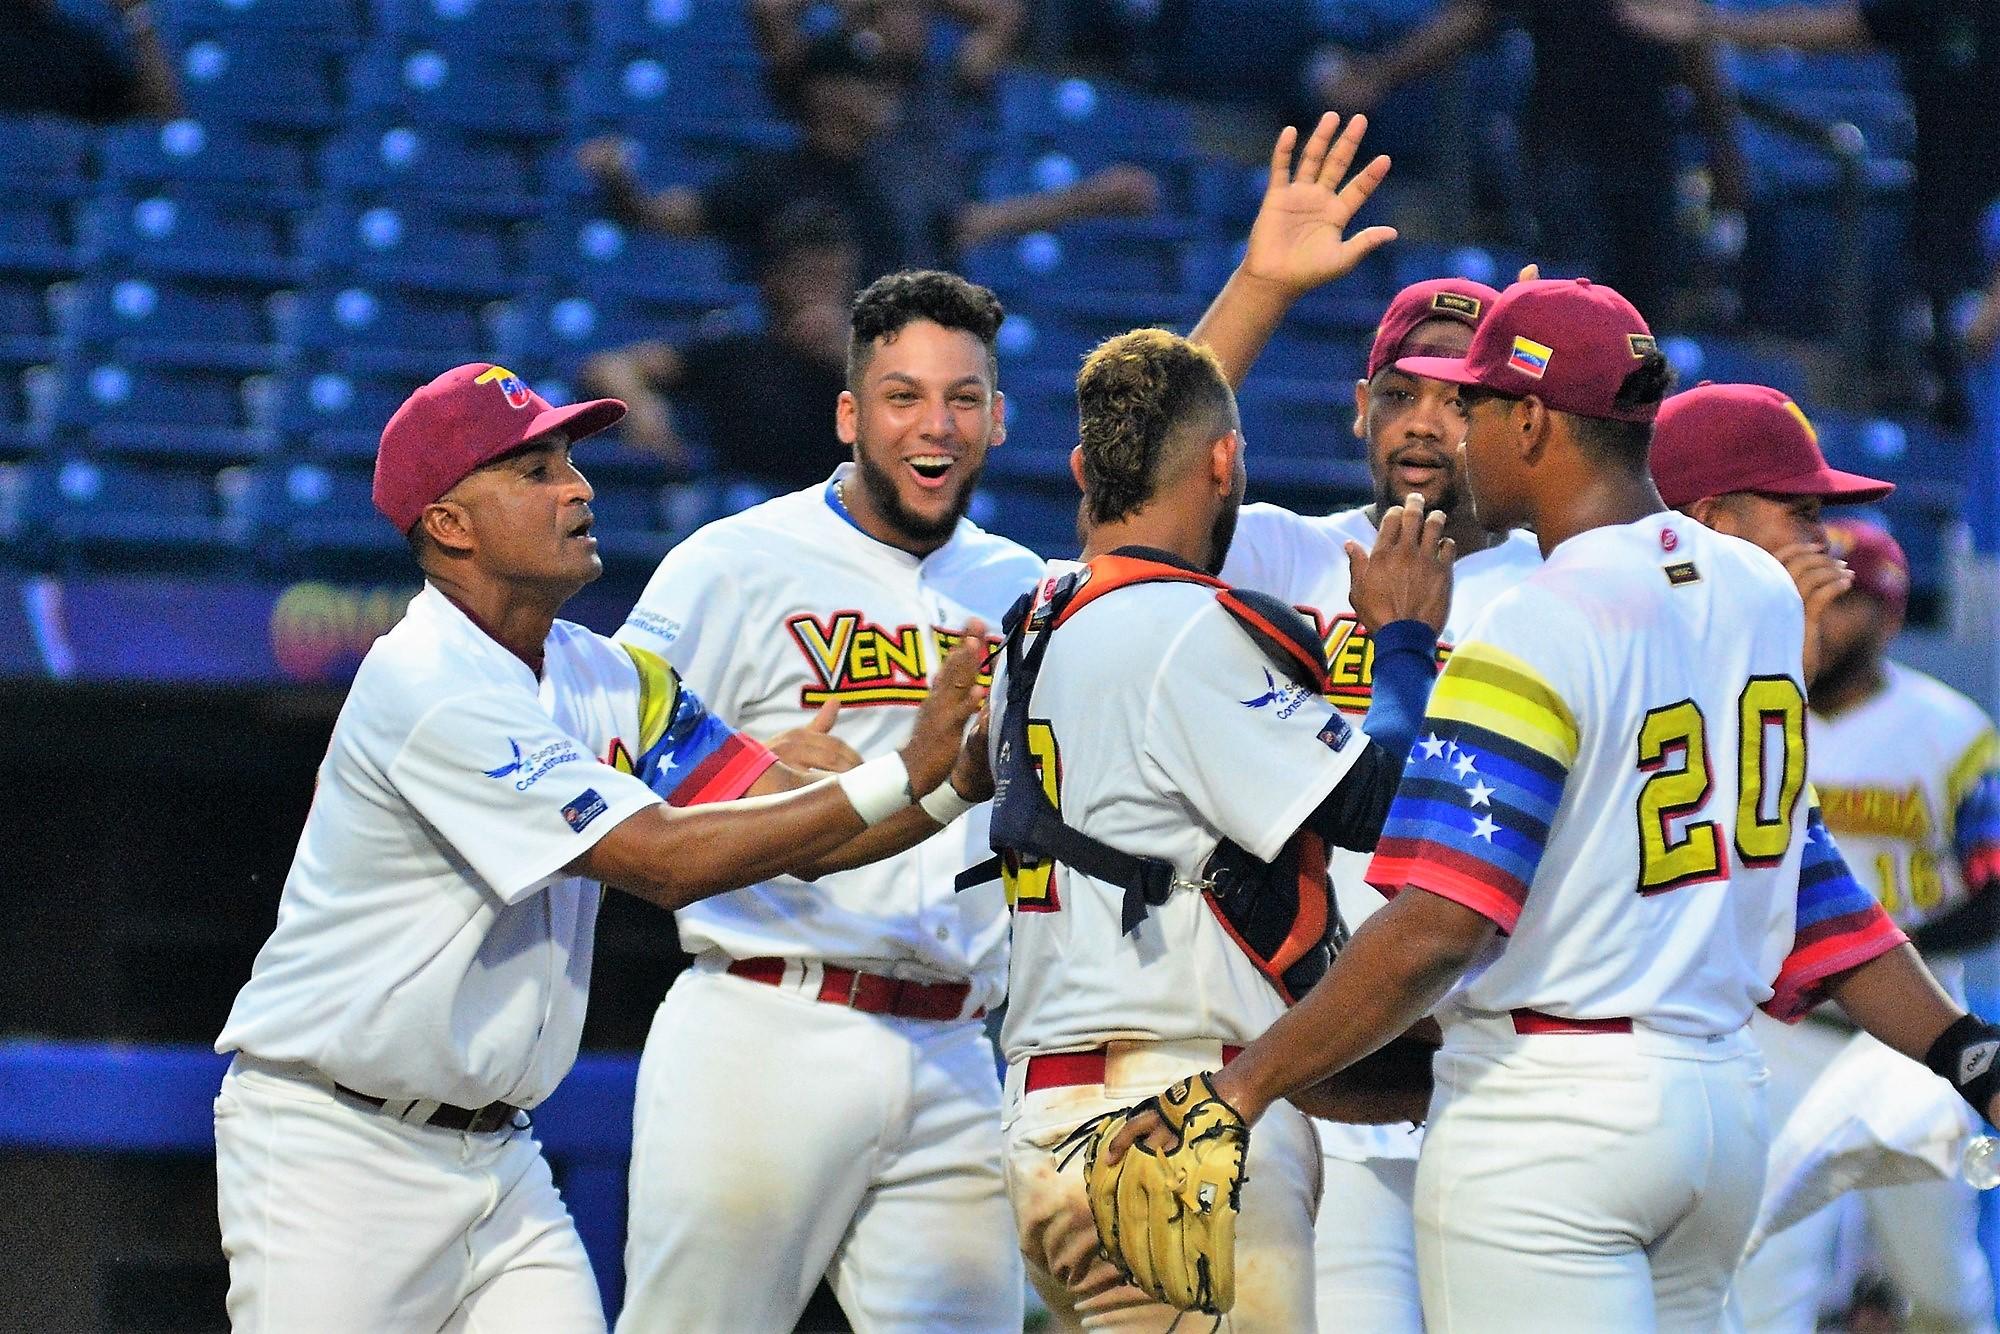 Venezuela's pklayers congratulate catcher Georvic Perez